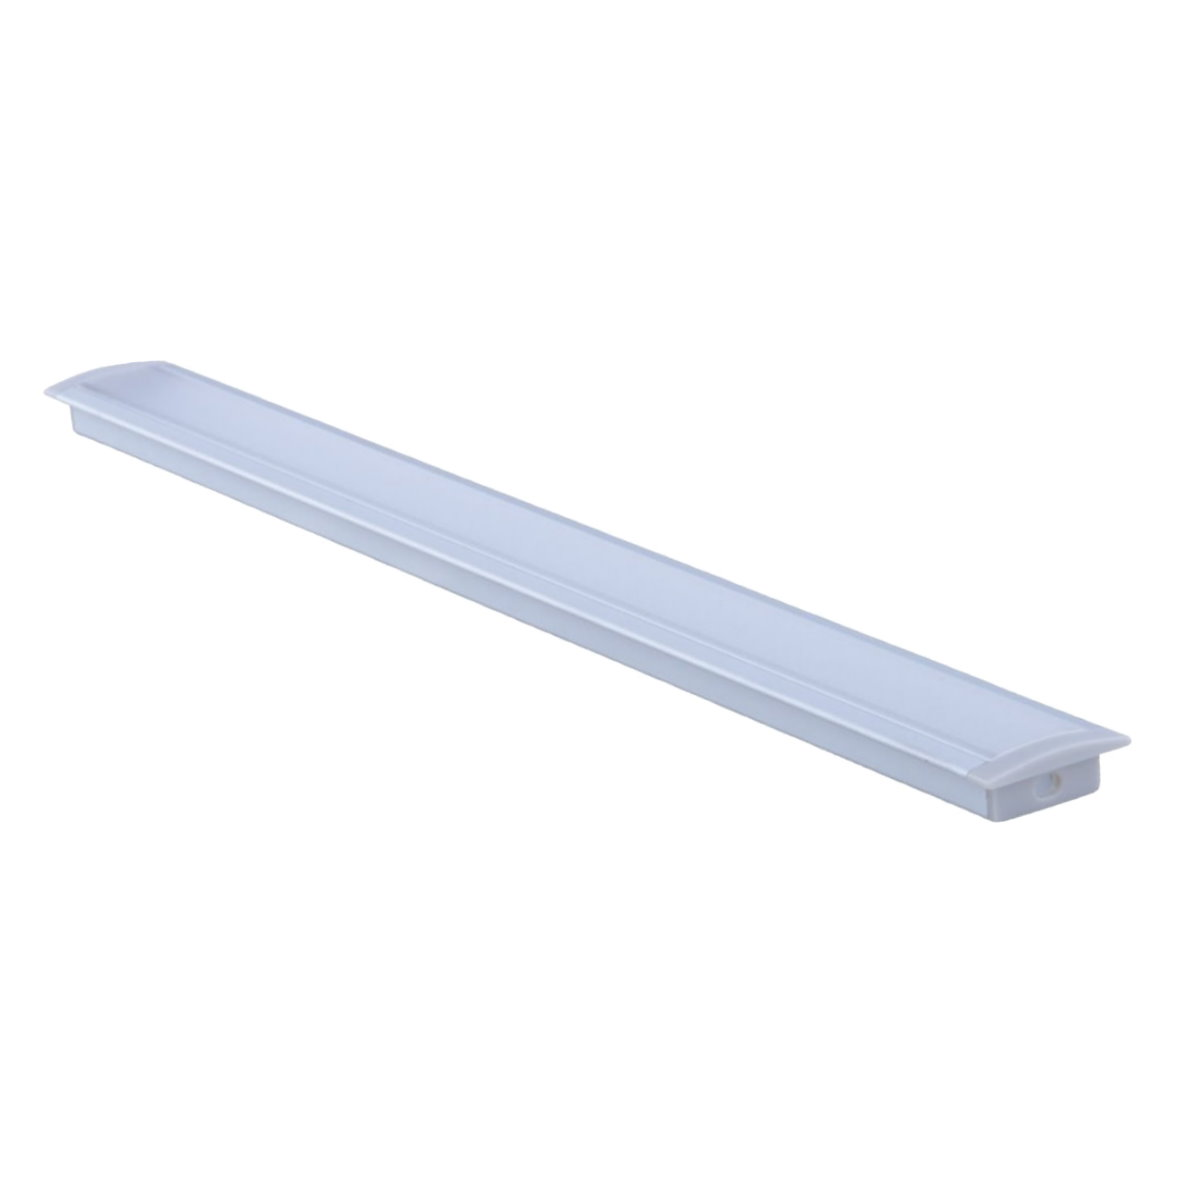 24 9 m led aluprofil alu profil lichtband schiene aluminium strip streifen ebay. Black Bedroom Furniture Sets. Home Design Ideas